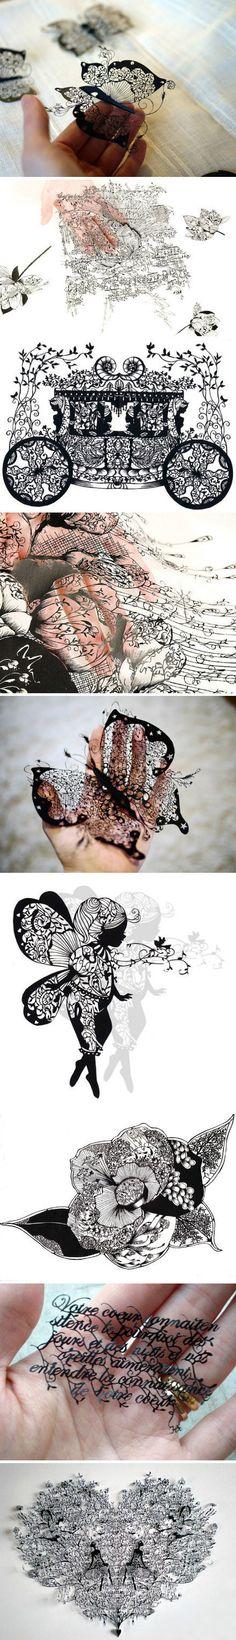 the art of cut paper